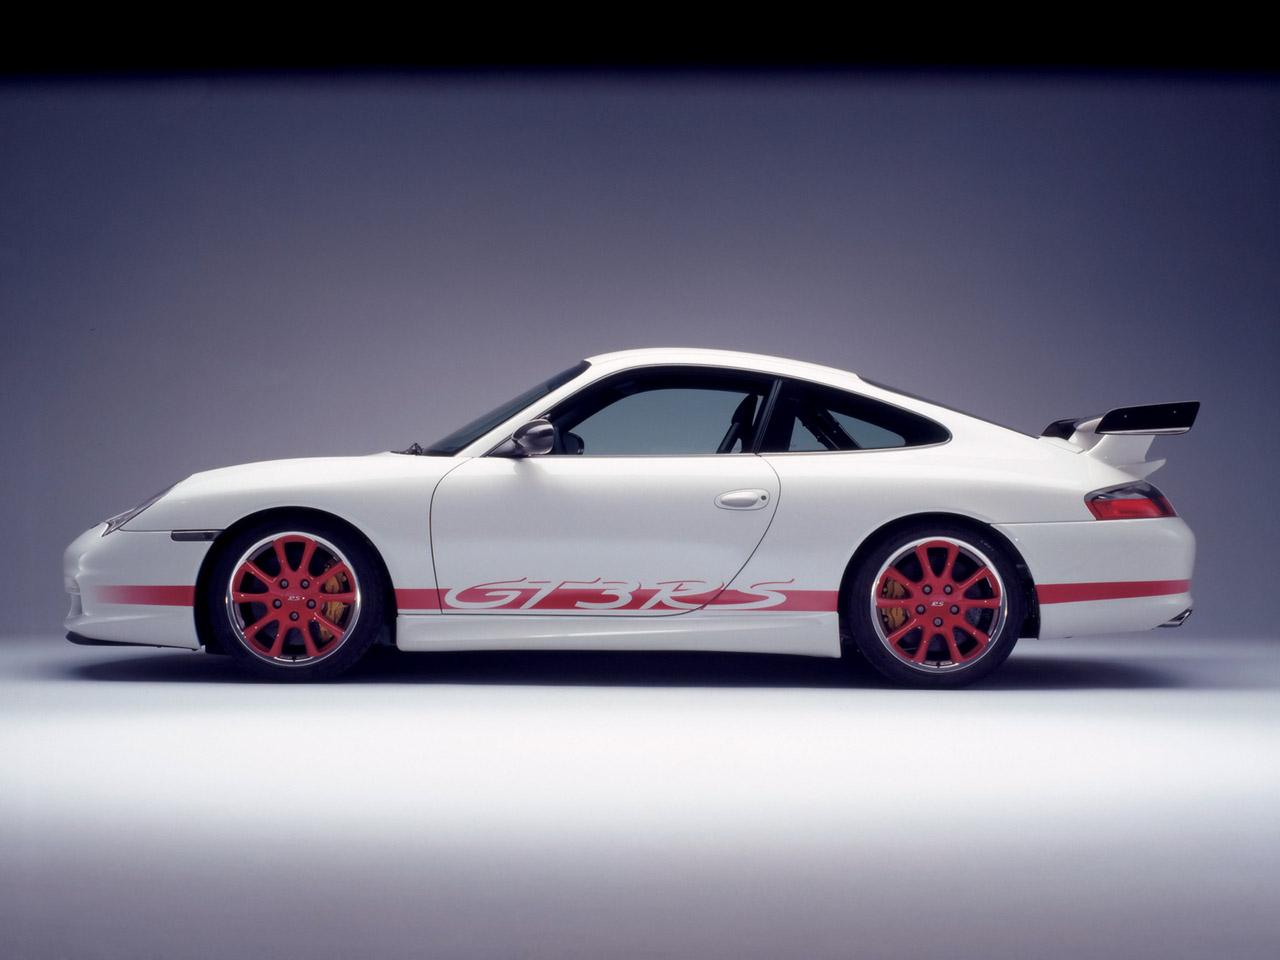 Turbo Wallpaper Car 2004 Porsche 911 Gt3 Rs History Pictures Value Auction